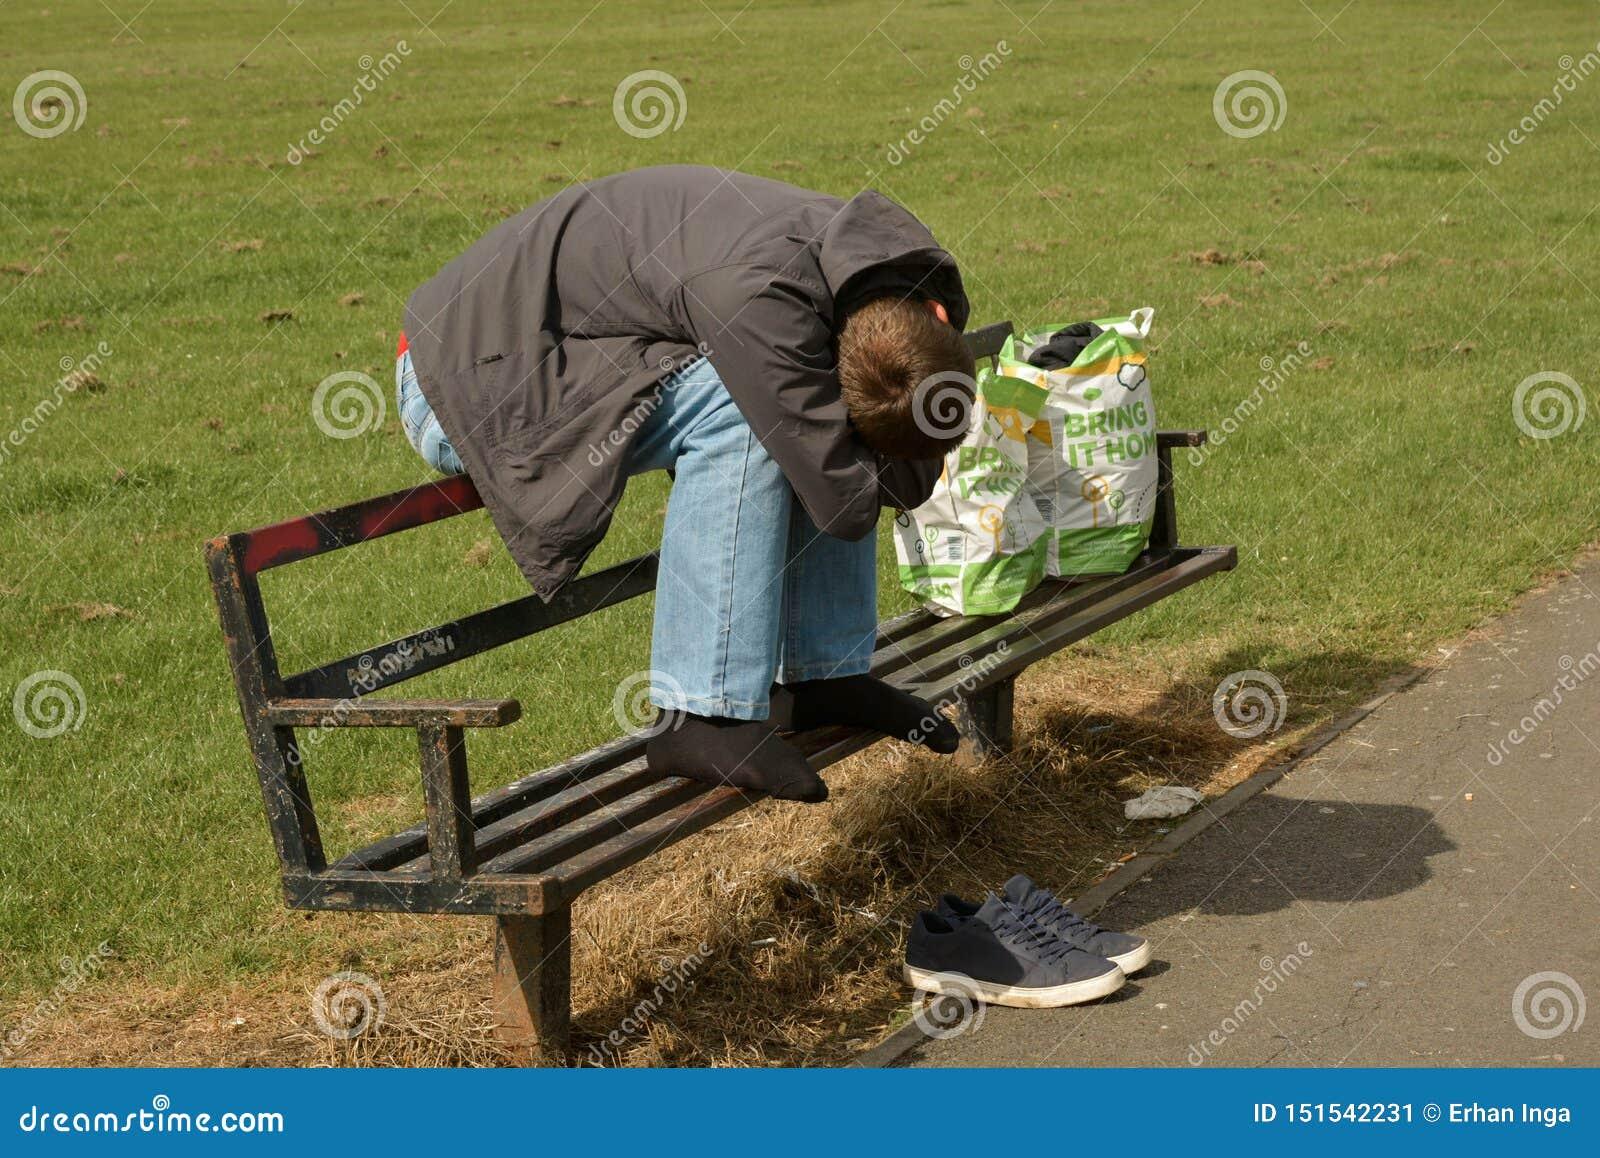 Corby, U ? , Στις 20 Ιουνίου 2019 - άστεγος ύπνος ατόμων σε έναν πάγκο έξω